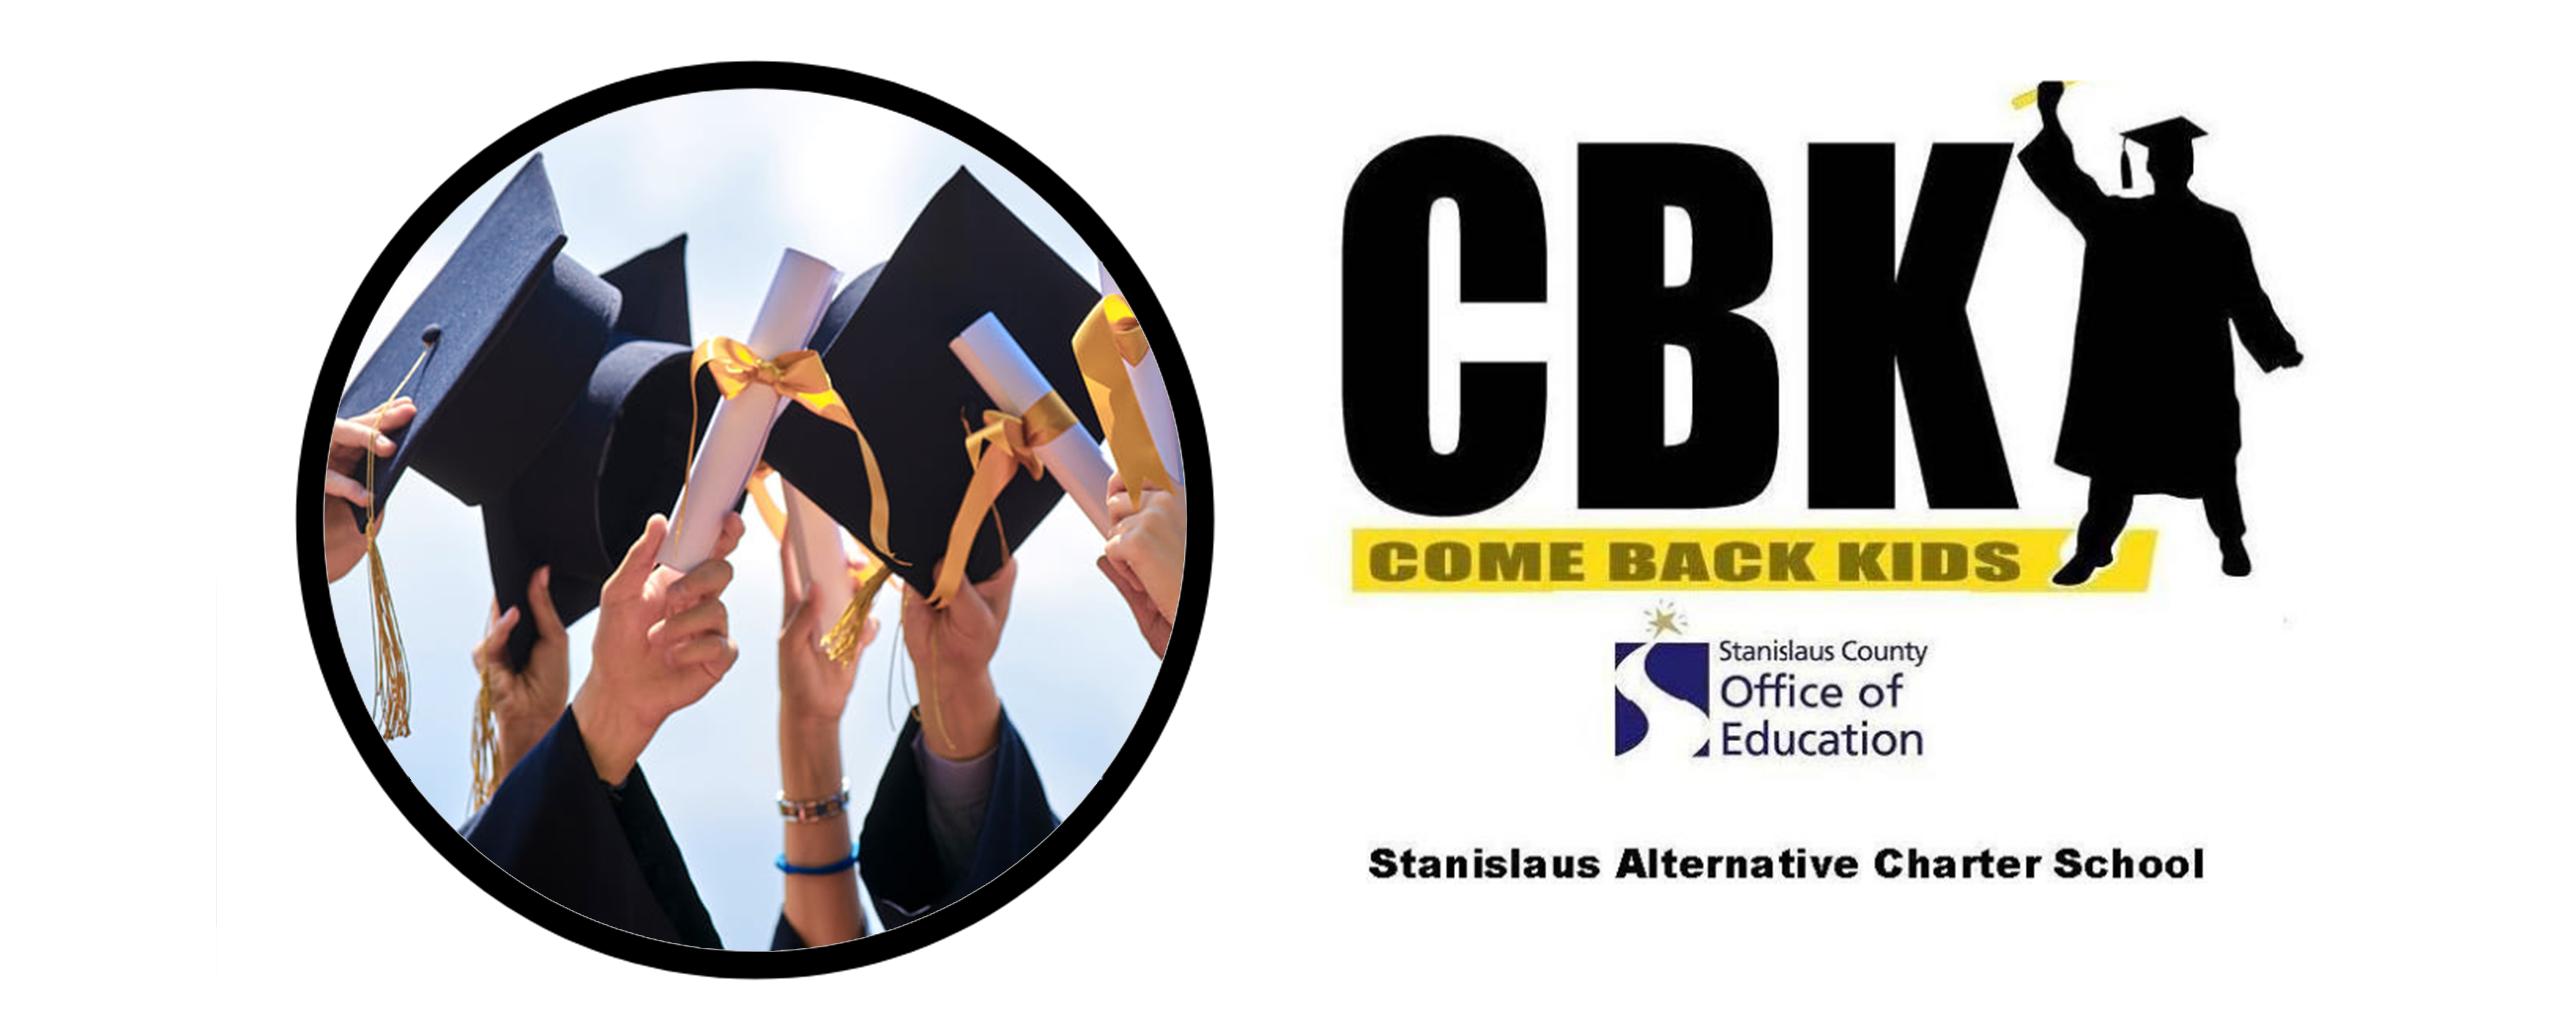 cbk logo with graduation caps and diplomas